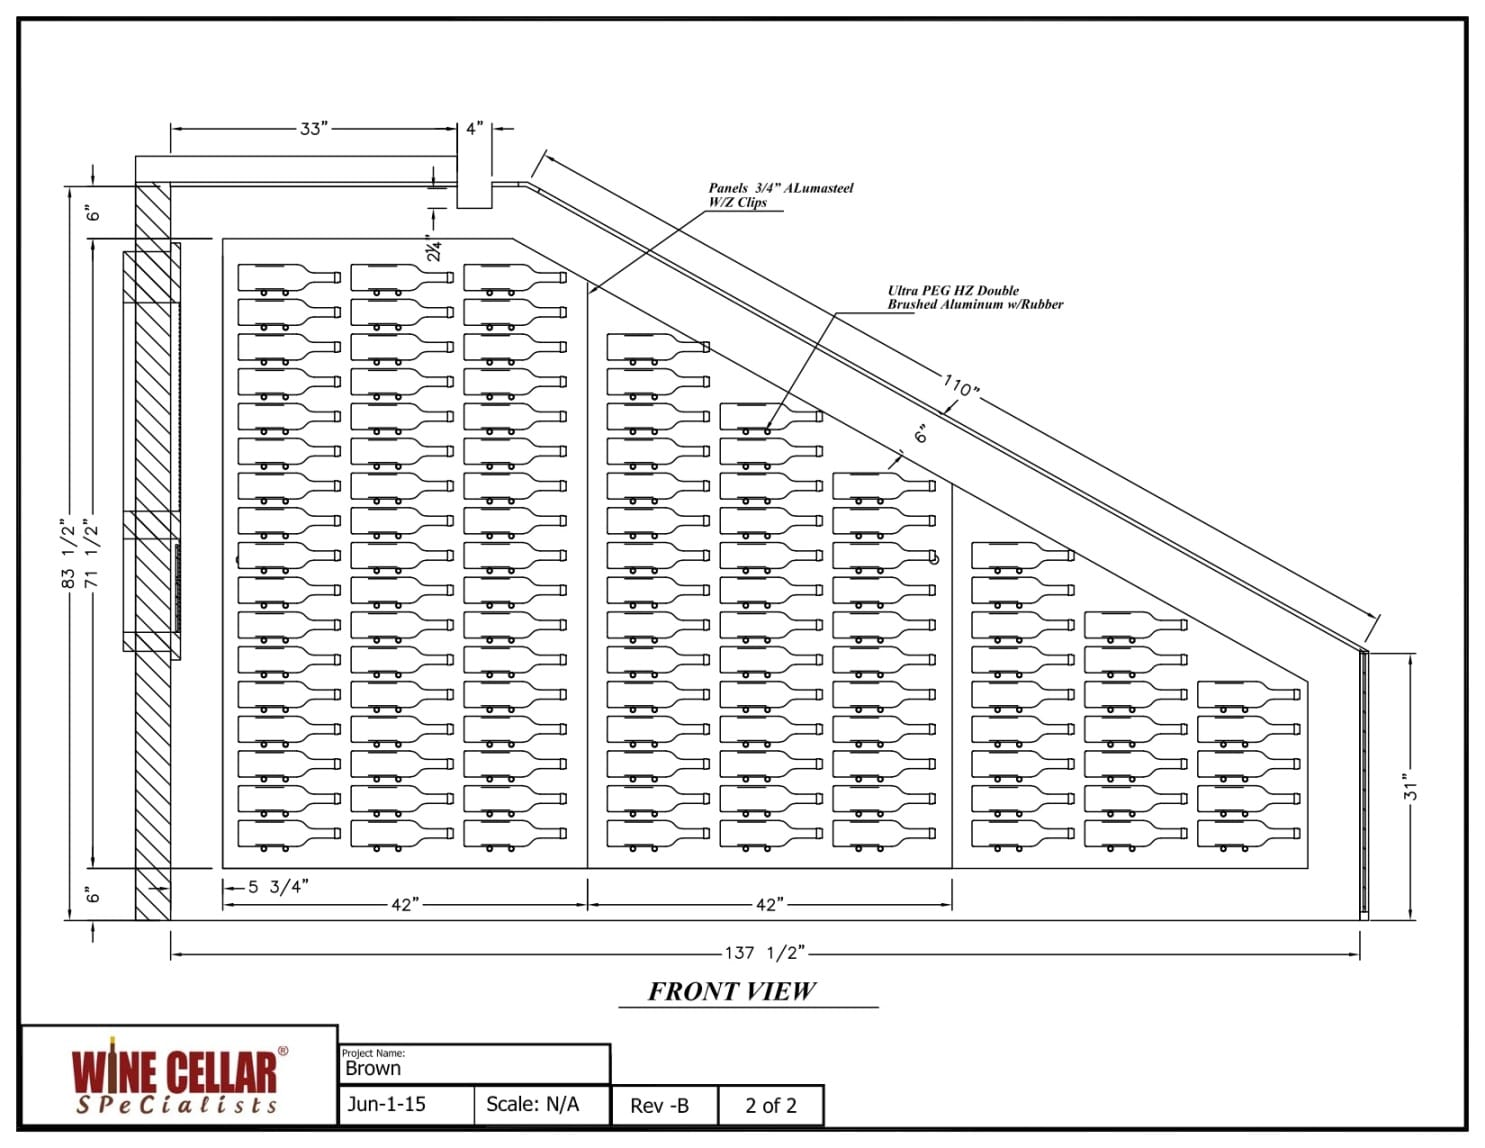 ... international 460 wiring diagram free download , john deere 270  alternator wiring diagram , 1973 nova wiring diagram , 1998 subaru legacy  stereo wiring ...